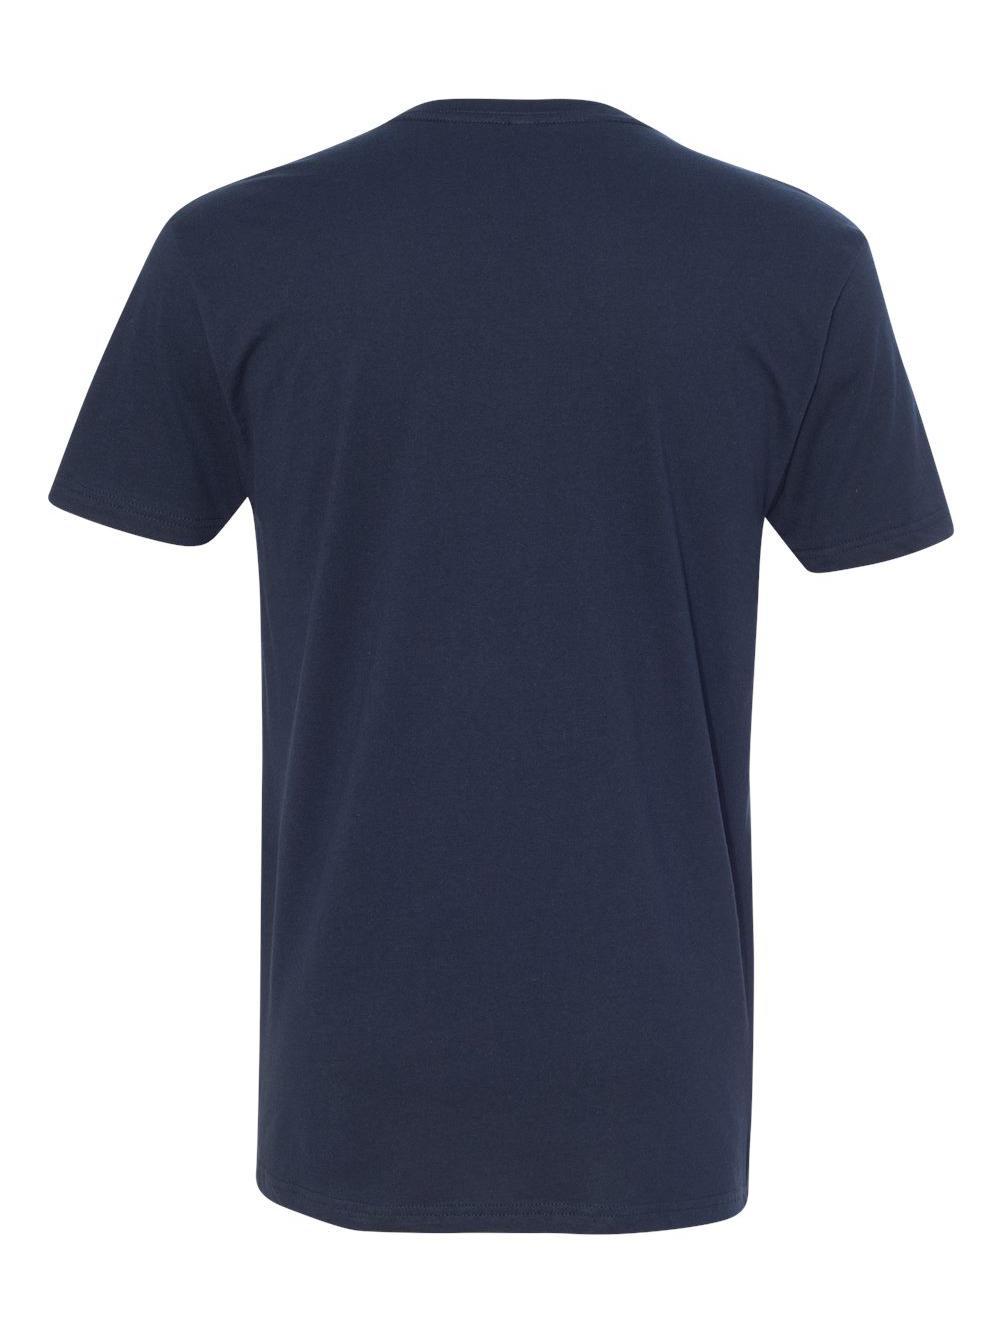 Next-Level-Premium-Short-Sleeve-V-3200 thumbnail 28